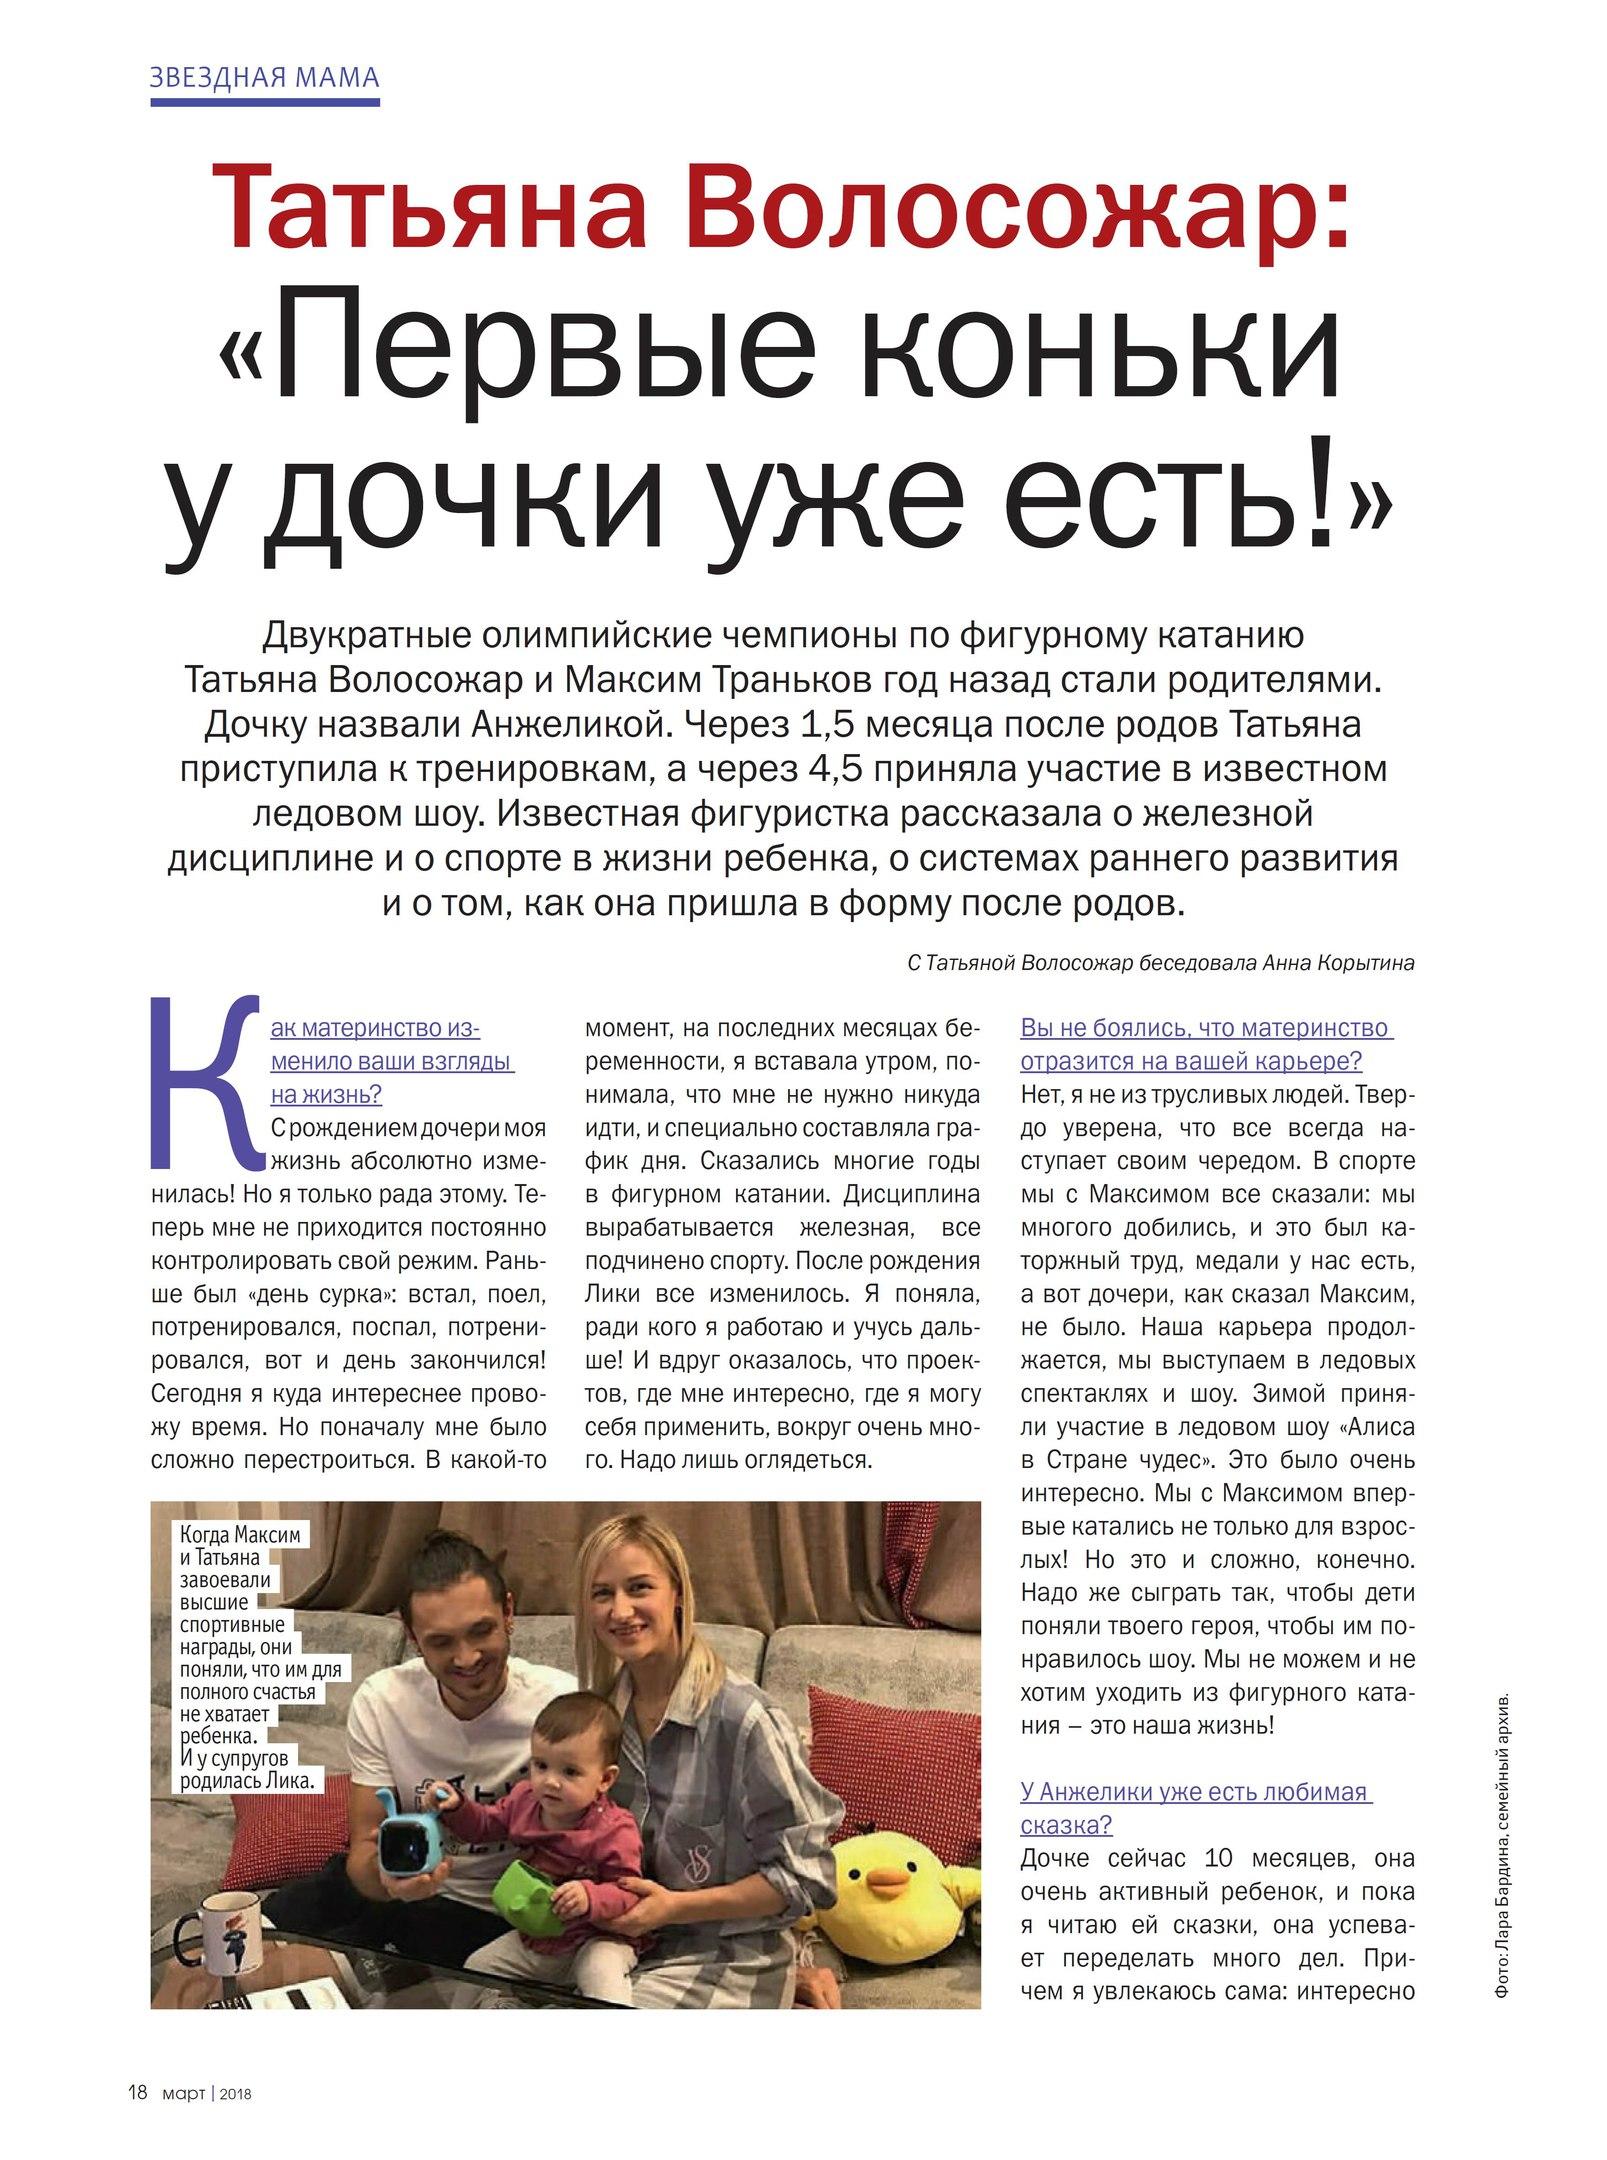 Татьяна Волосожар - Максим Траньков-4 - Страница 14 Flfi4TC9iTE